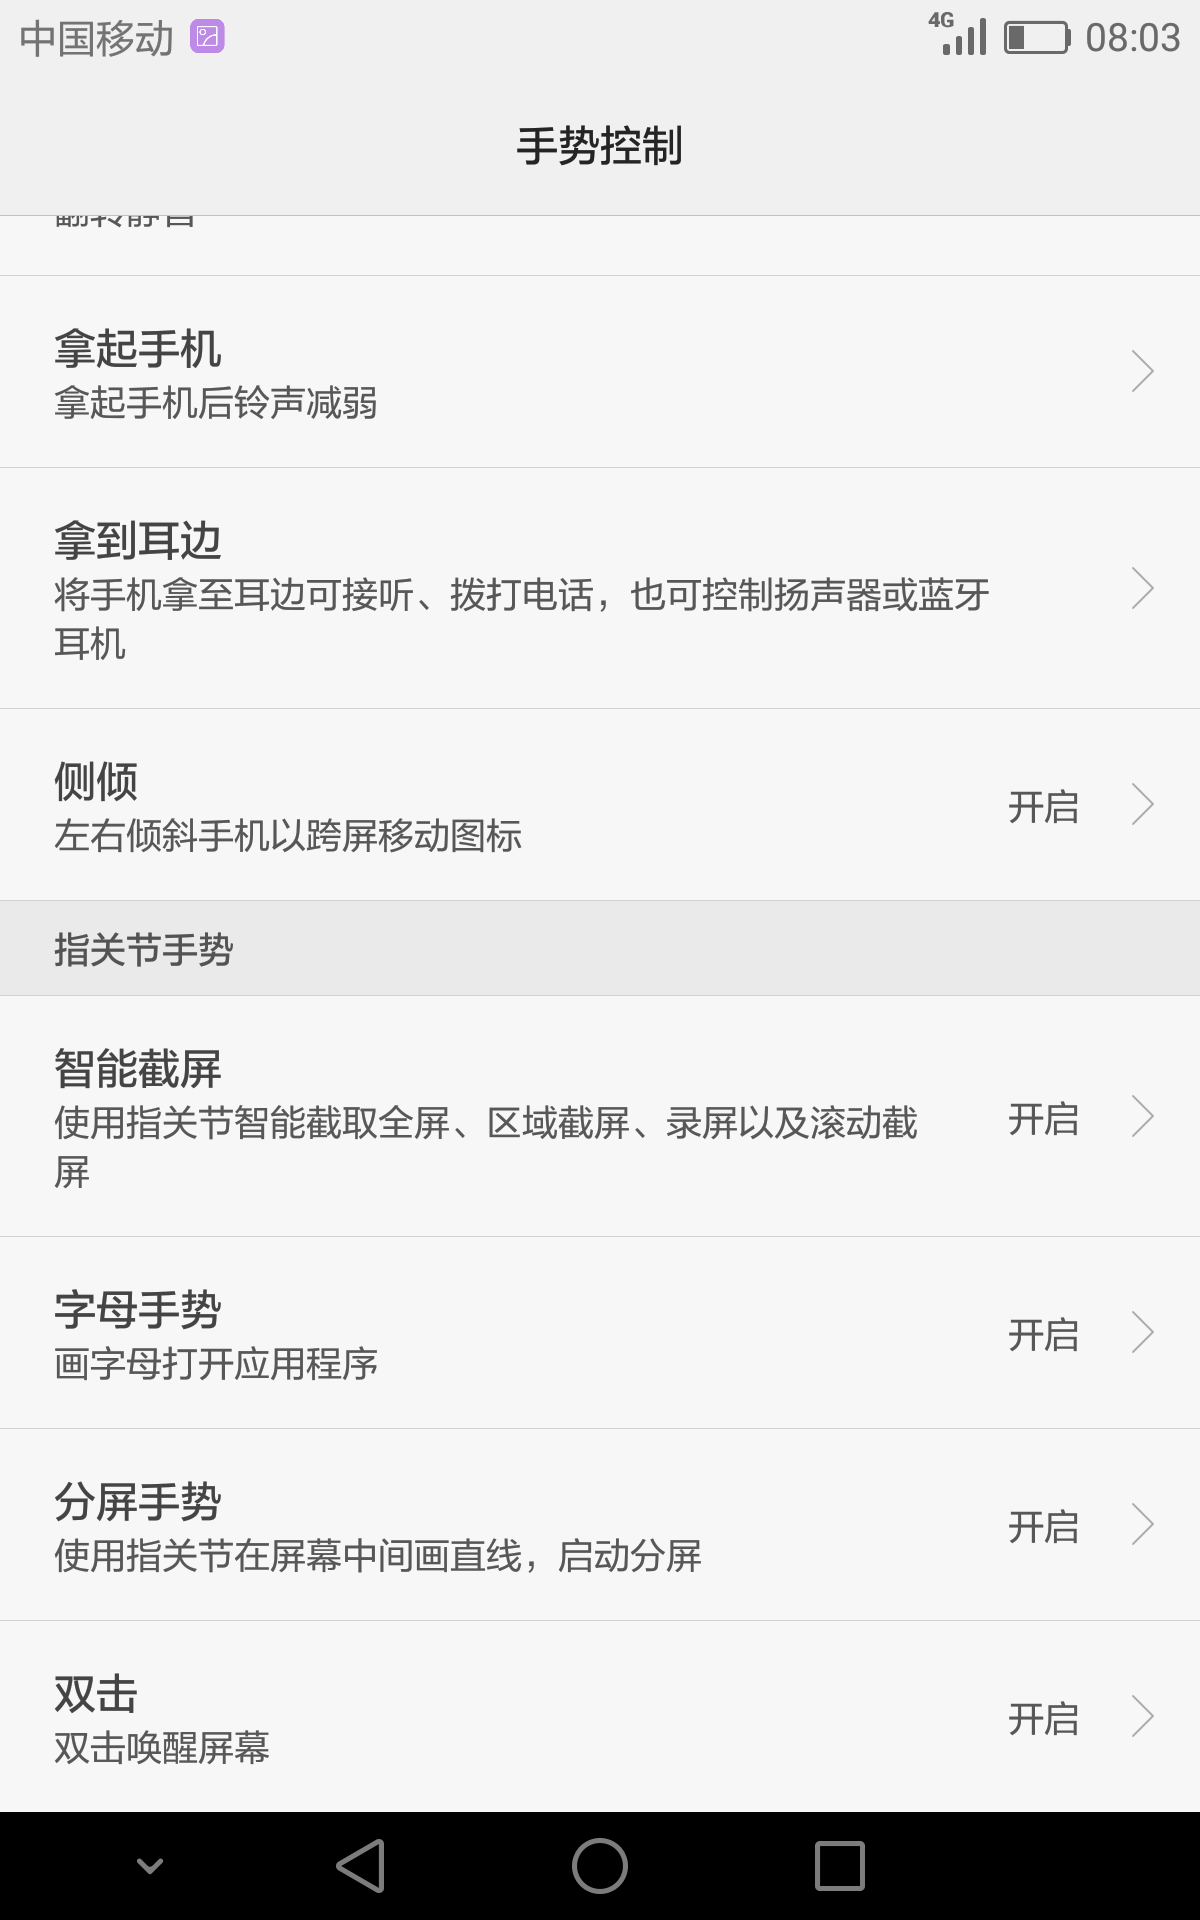 Screenshot_2018-04-04-08-03-52.png